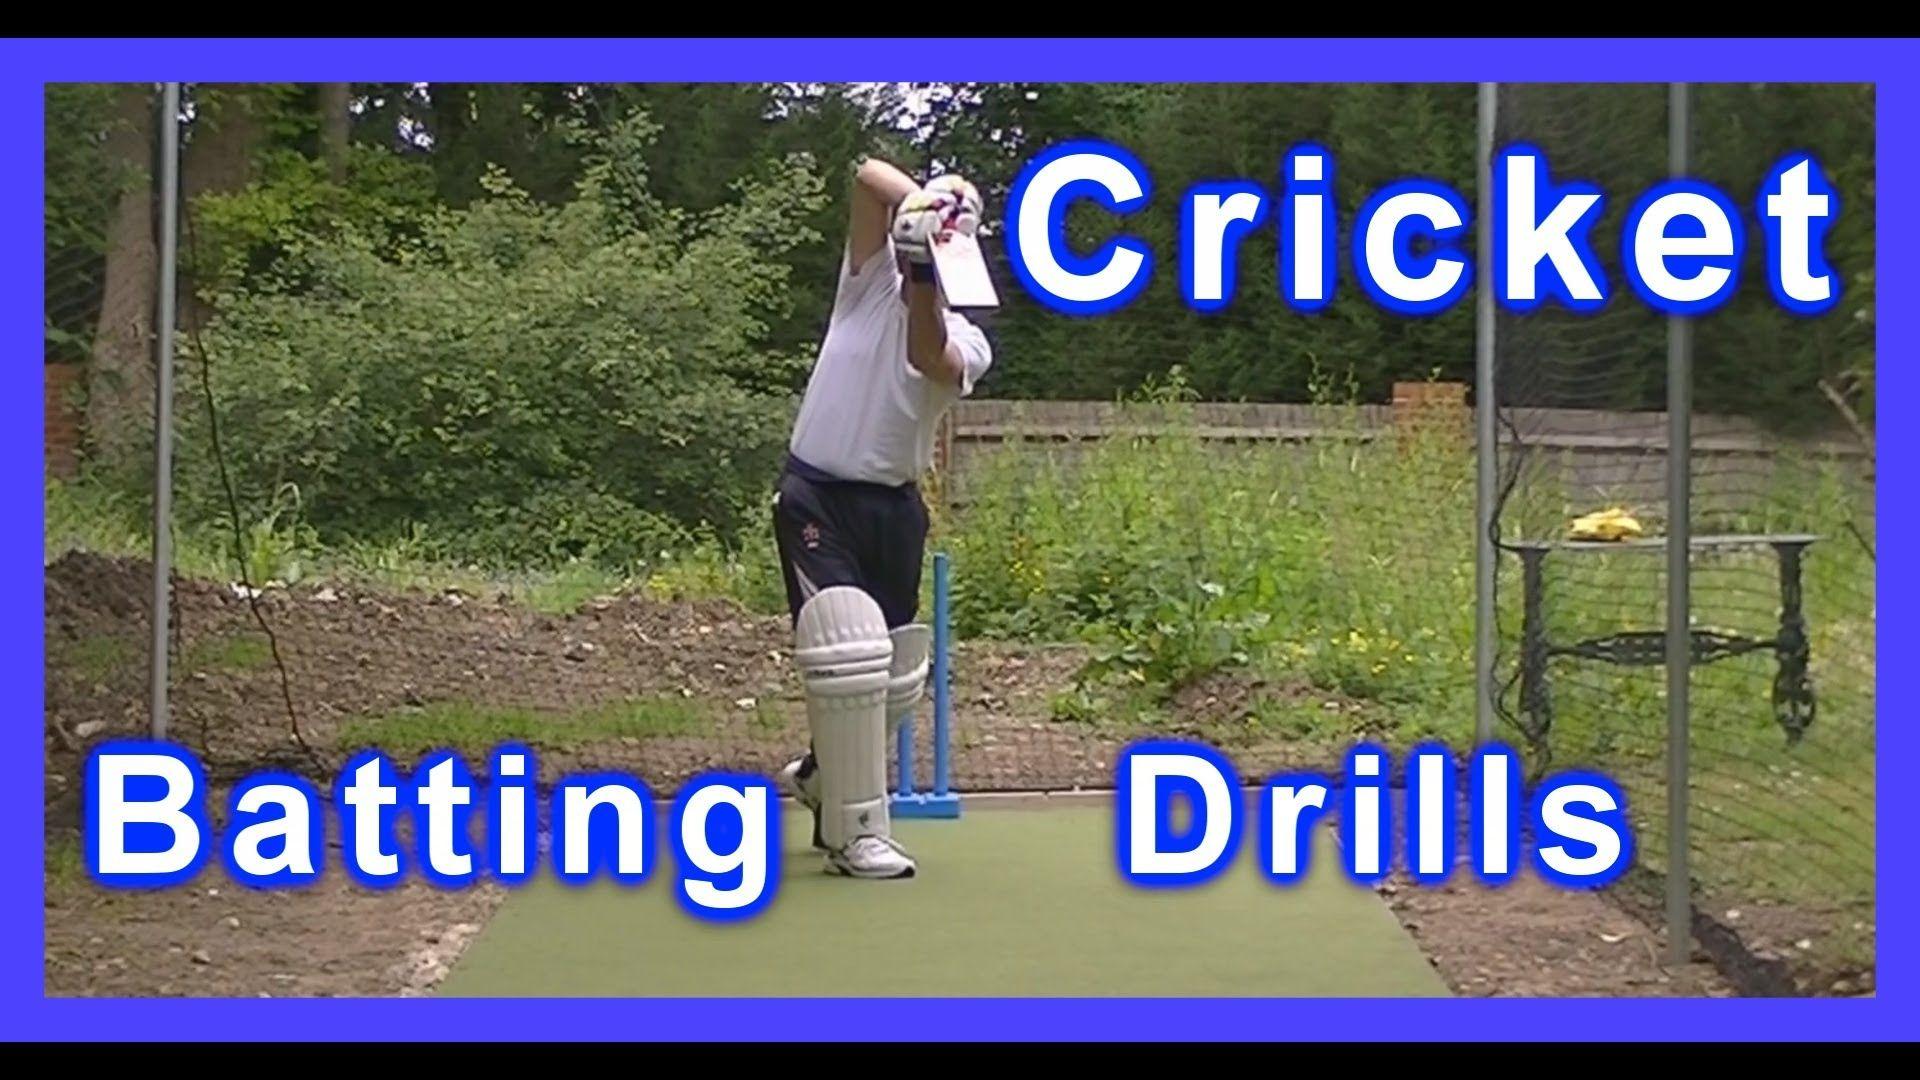 left hand hd cricket coaching batting drills training practice off